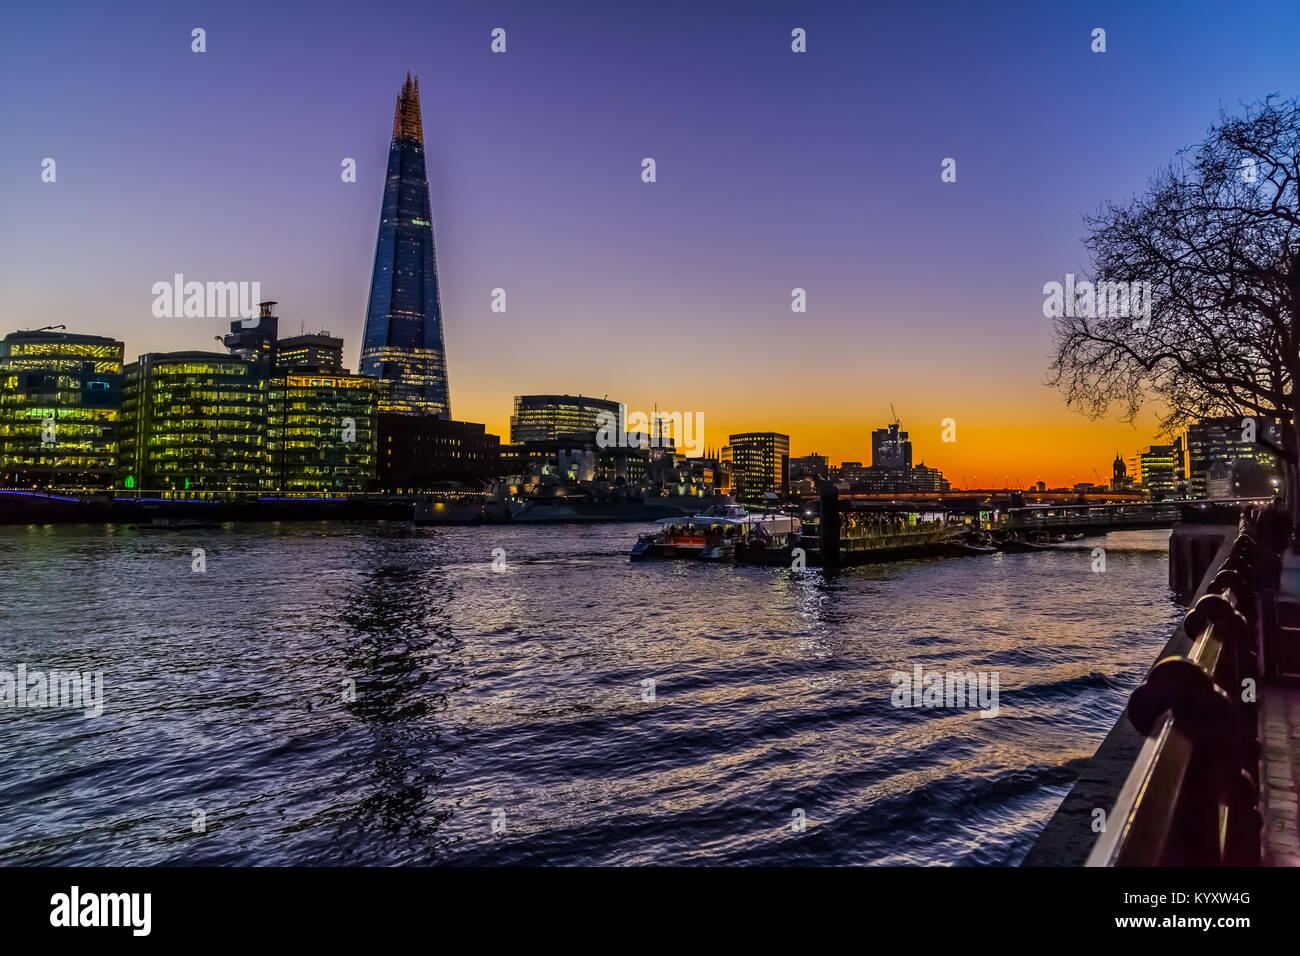 The Shard, Embankment / River Thames, London Stock Photo